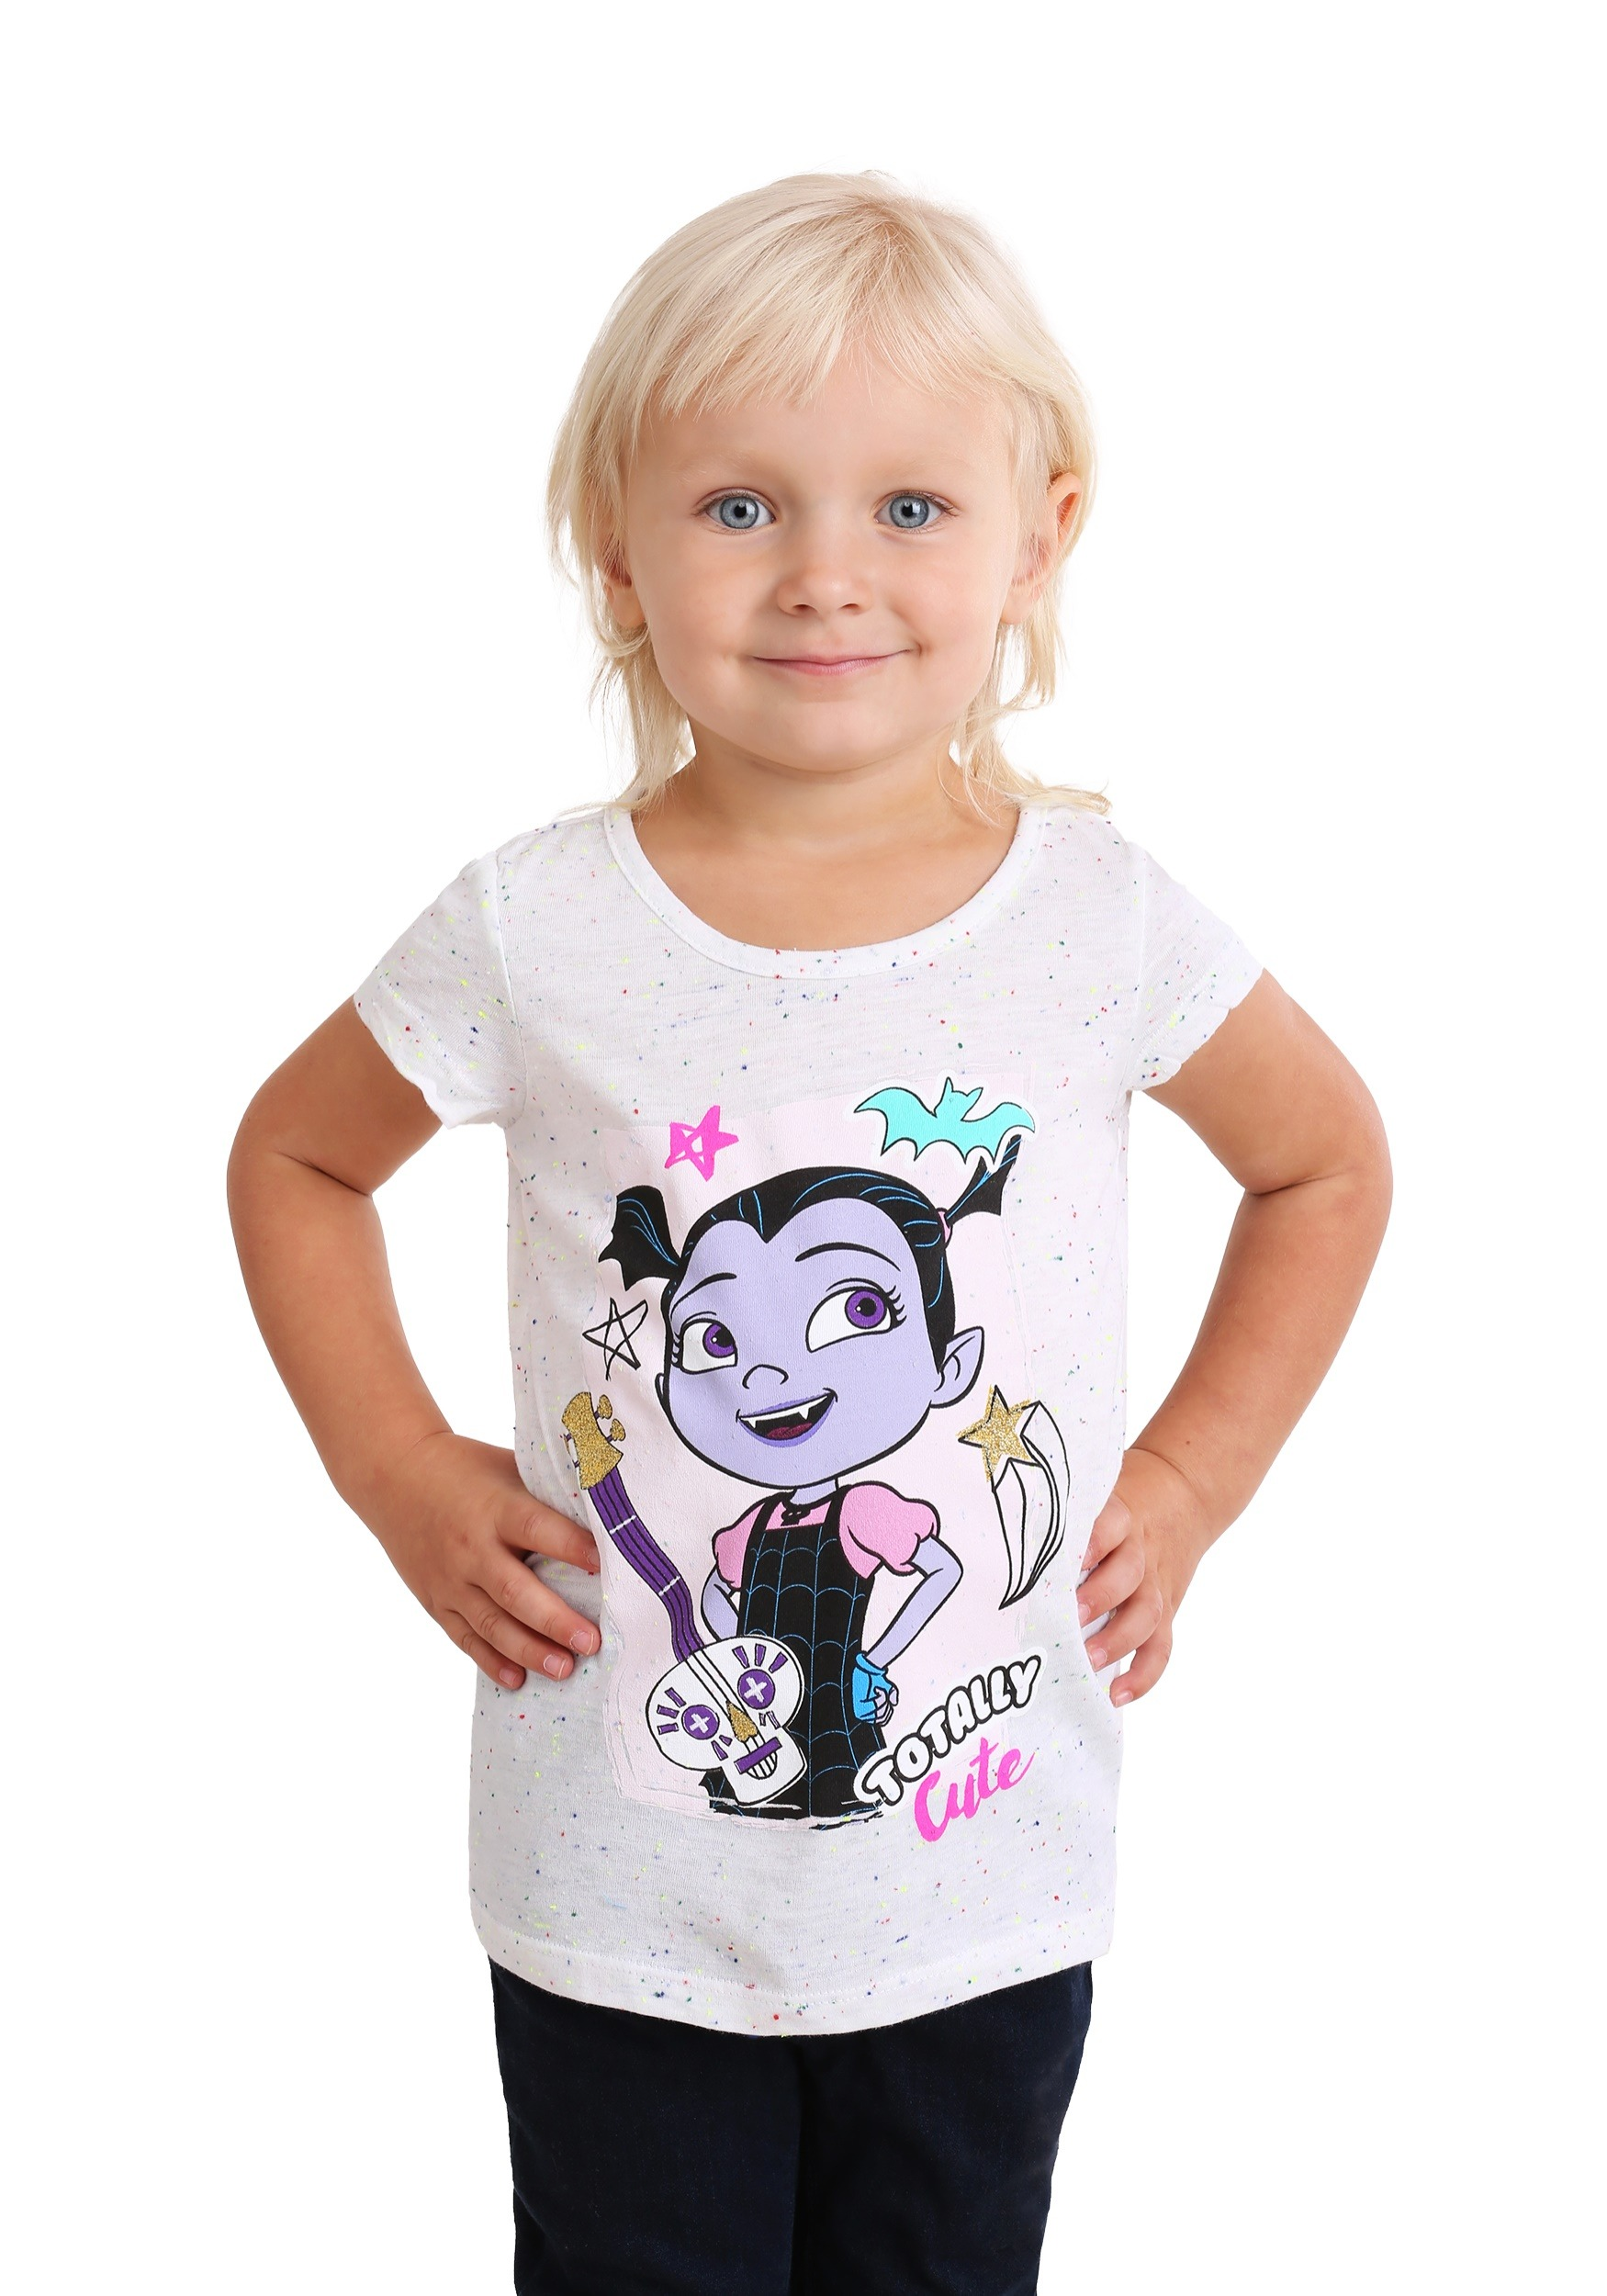 Vampirina Totally Cute T-Shirt Girl's Toddler